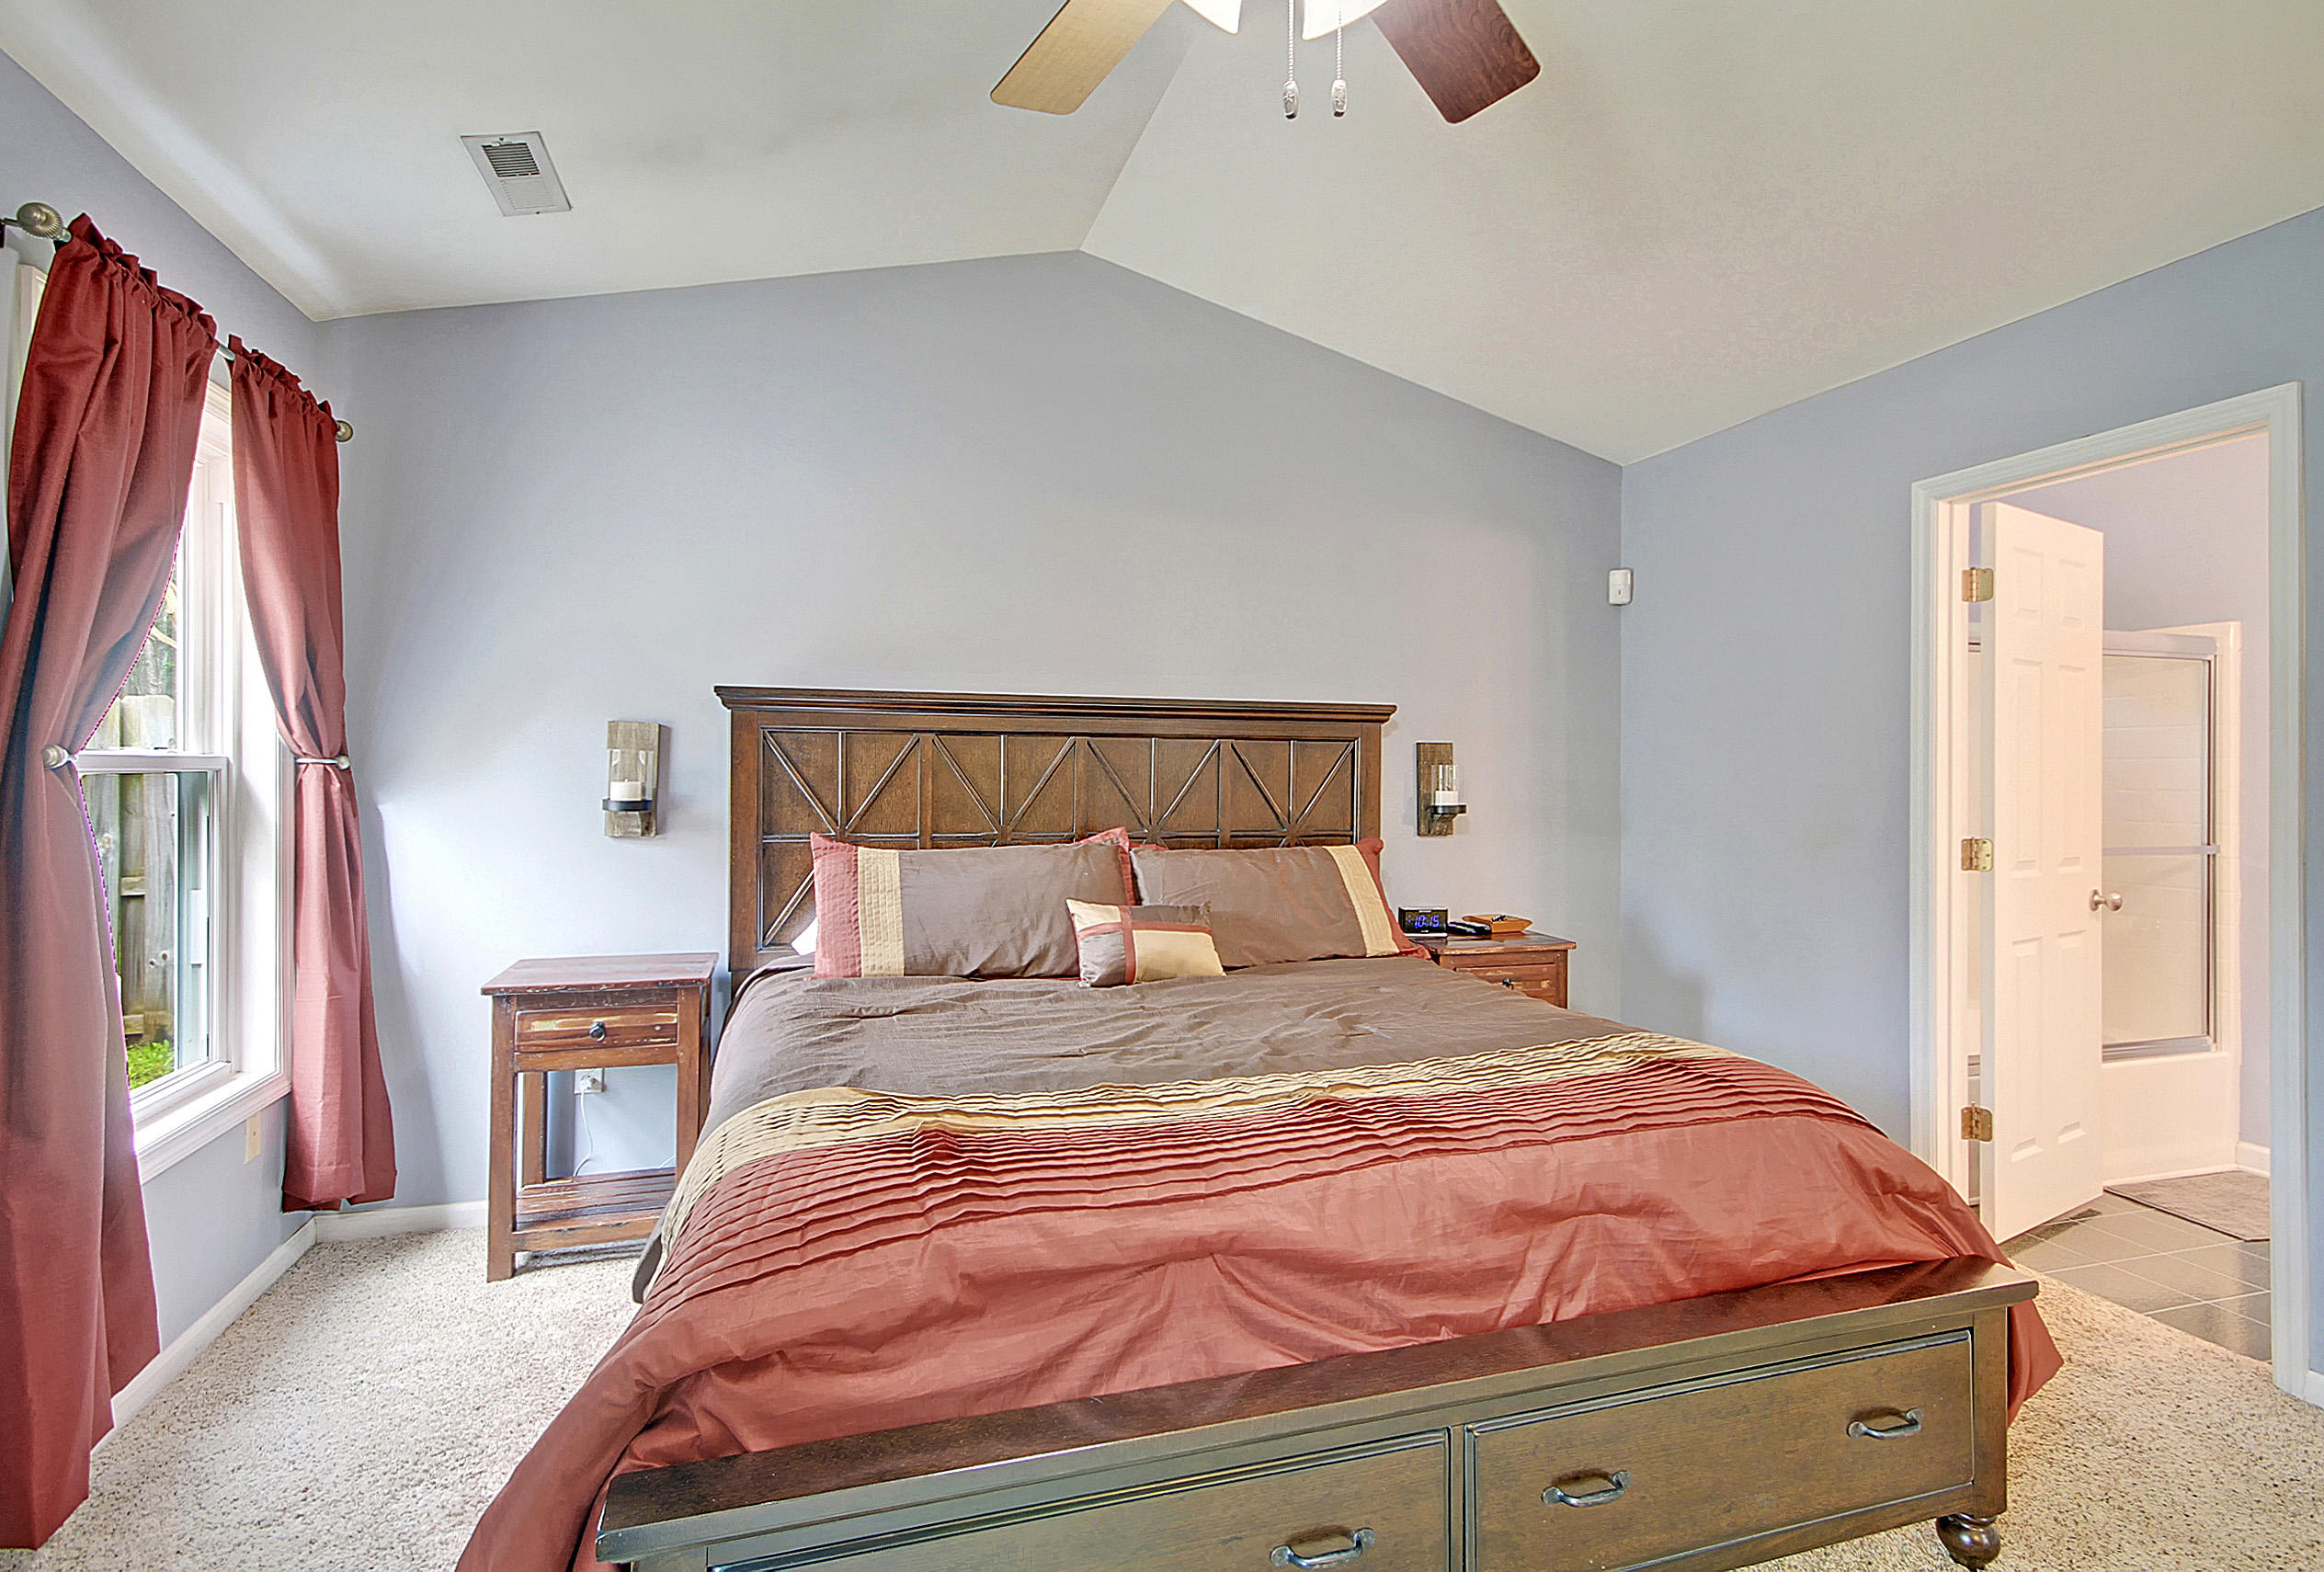 Park West Homes For Sale - 1460 Wellesley, Mount Pleasant, SC - 28